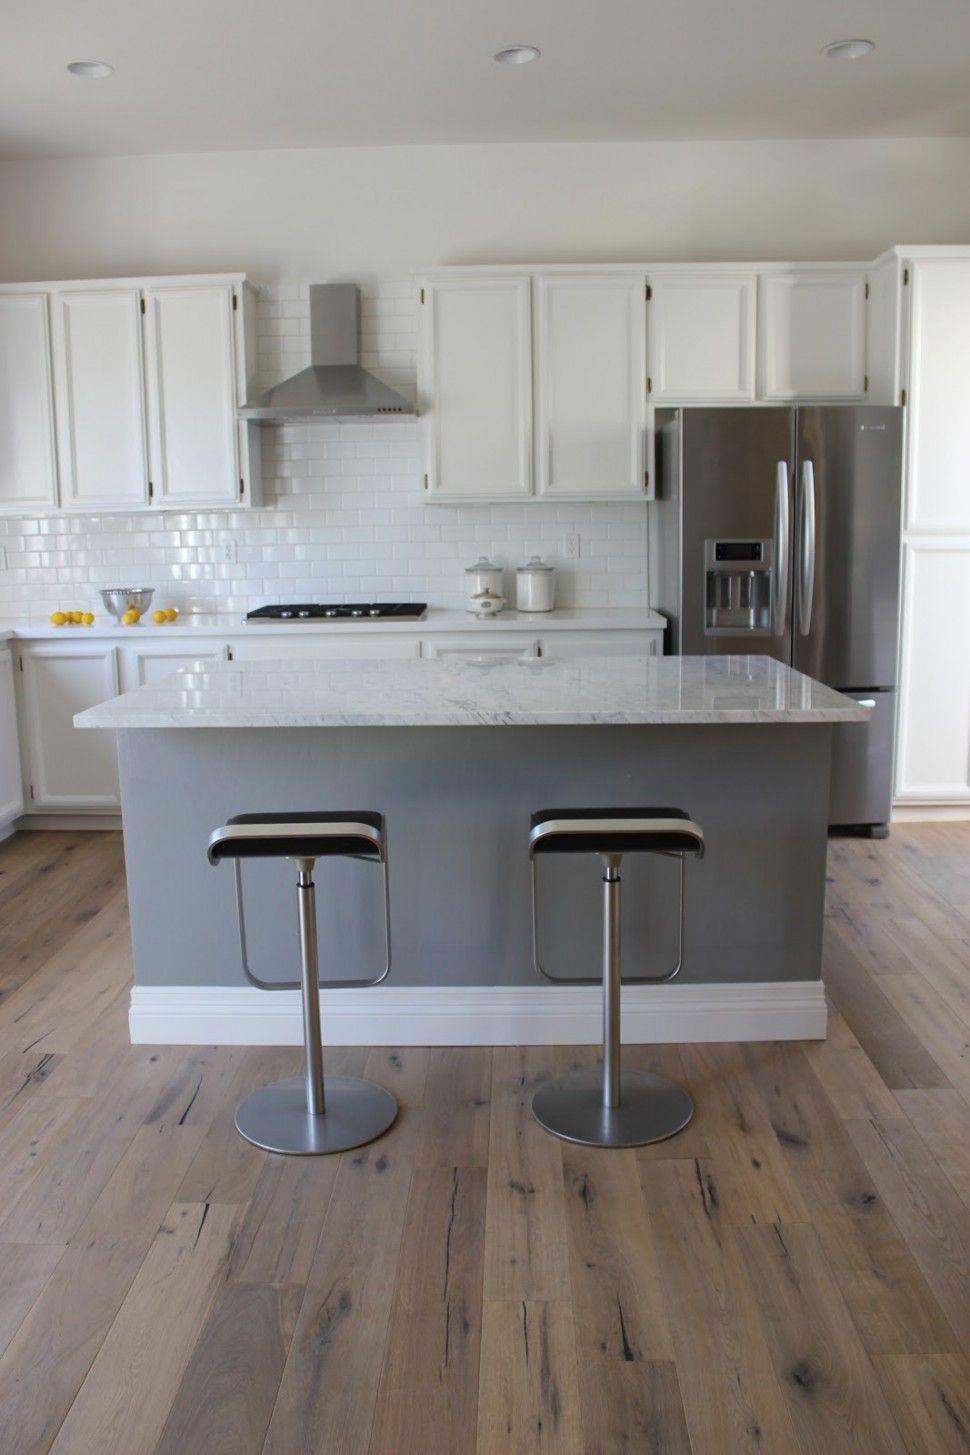 Perfect Kitchen:Kitchen Minimalist Small Kitchen Decoration And White Subway Tile  Kitchen Backspla Using Light Gray Nice Look